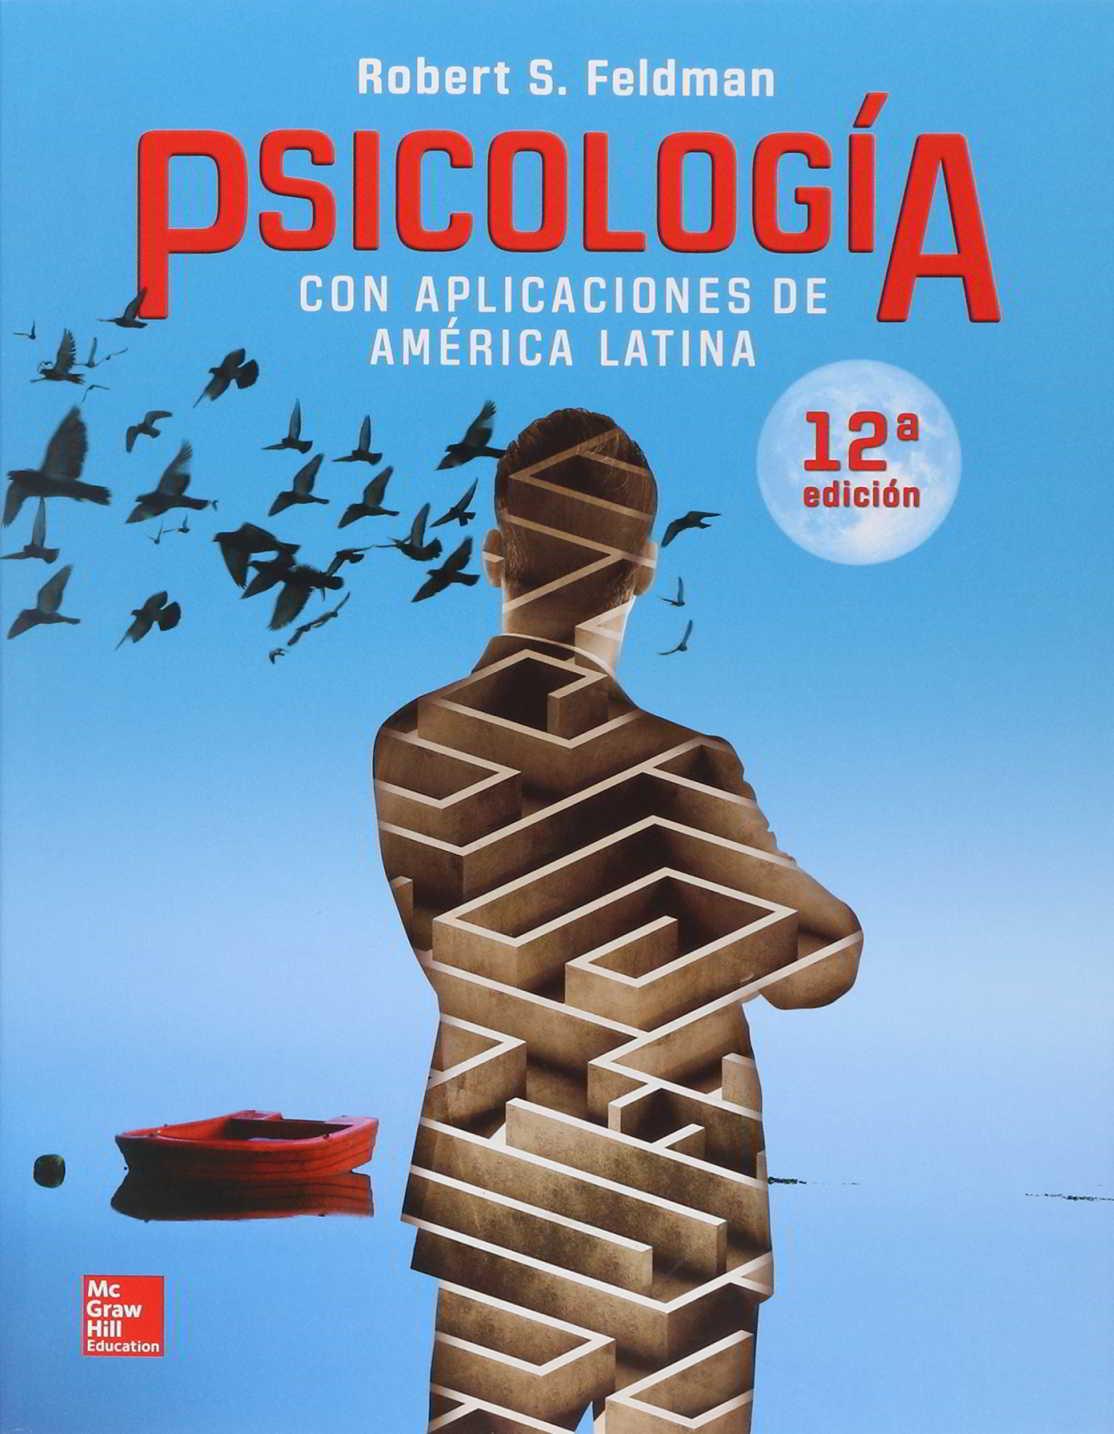 Robert Feldman Libro Psicologia